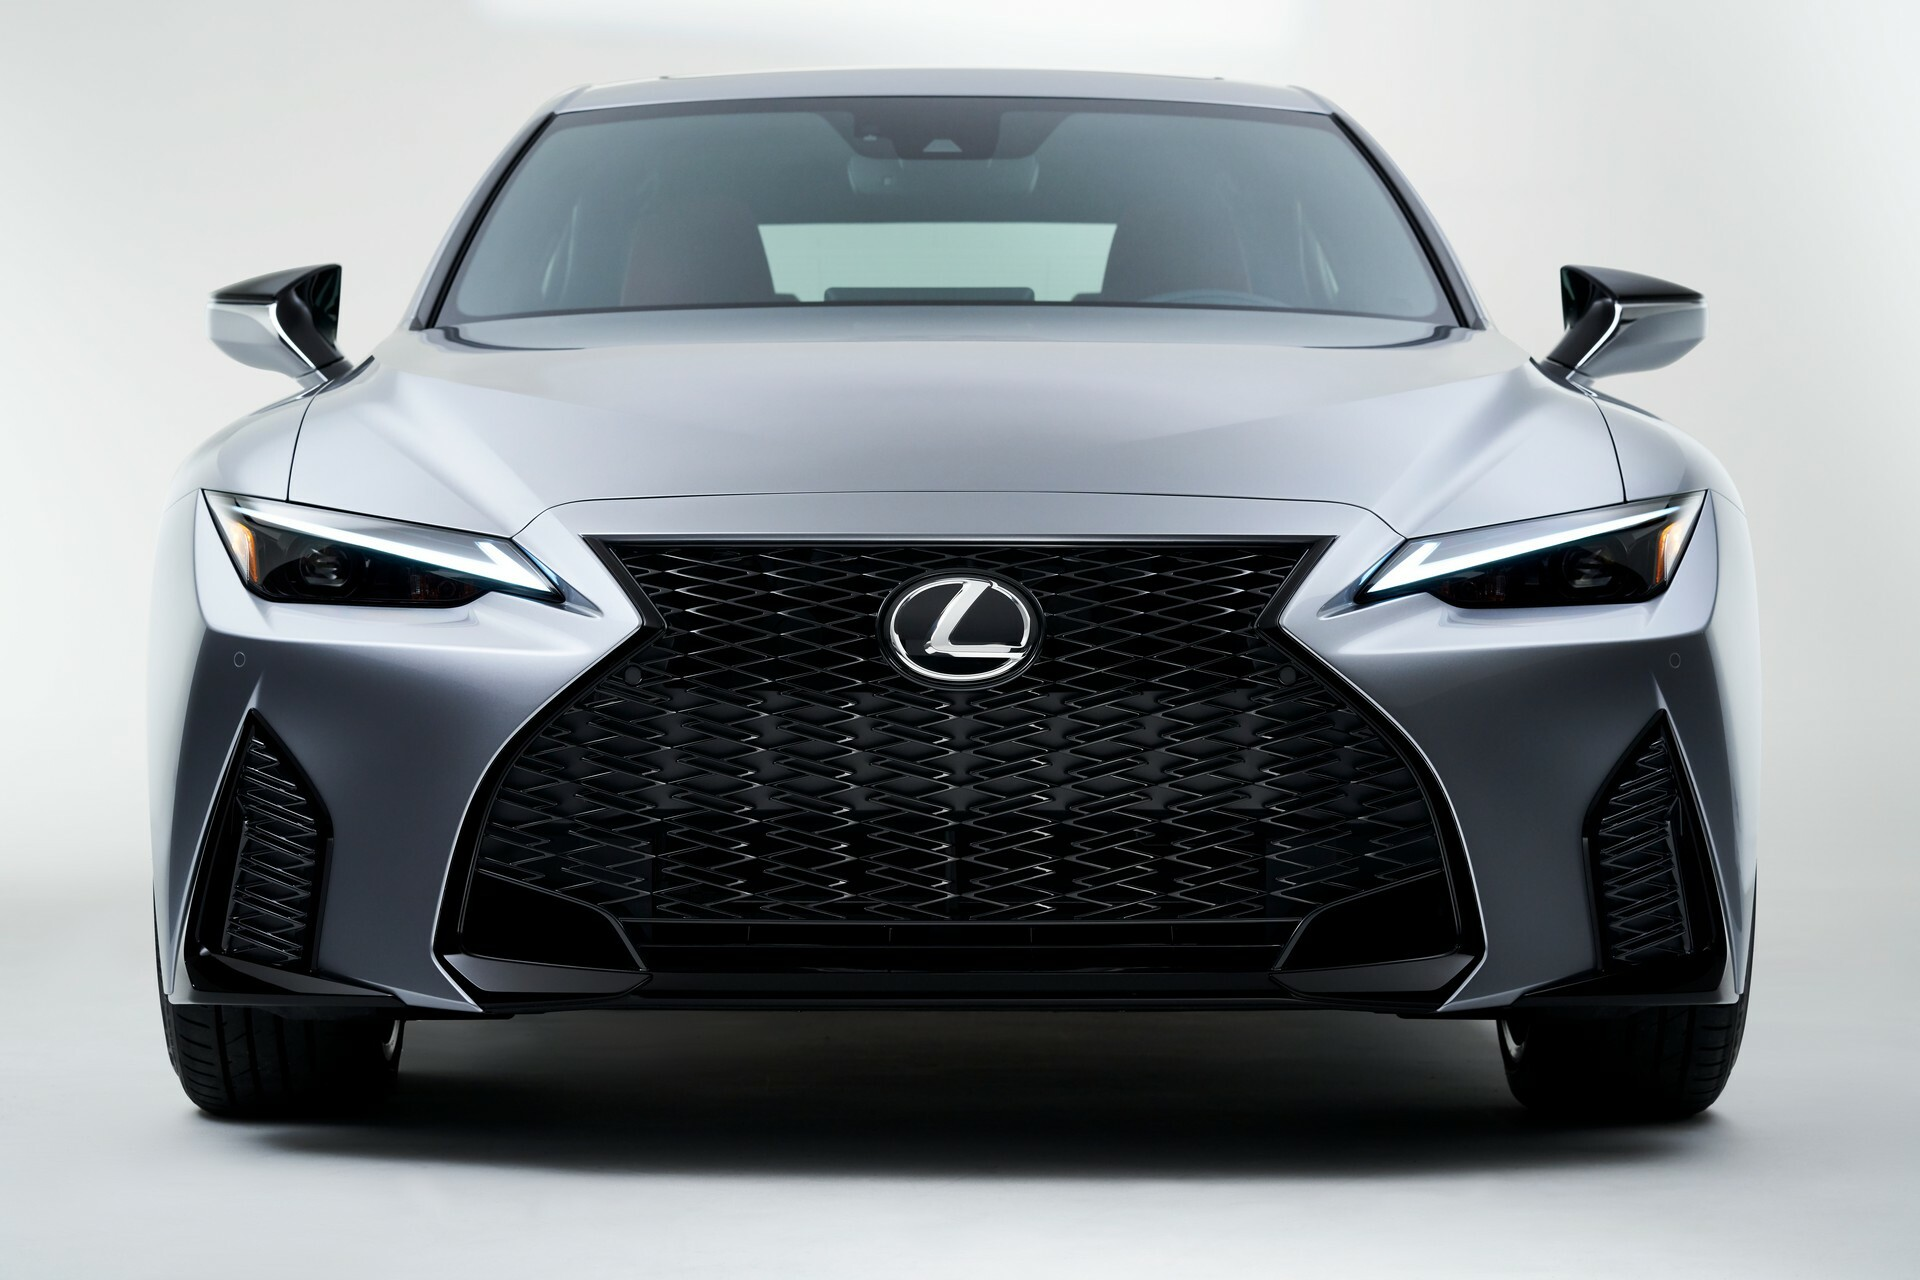 luoi-tan-nhiet-3d-Lexus-IS-2021-danhgiaxehoi-vn